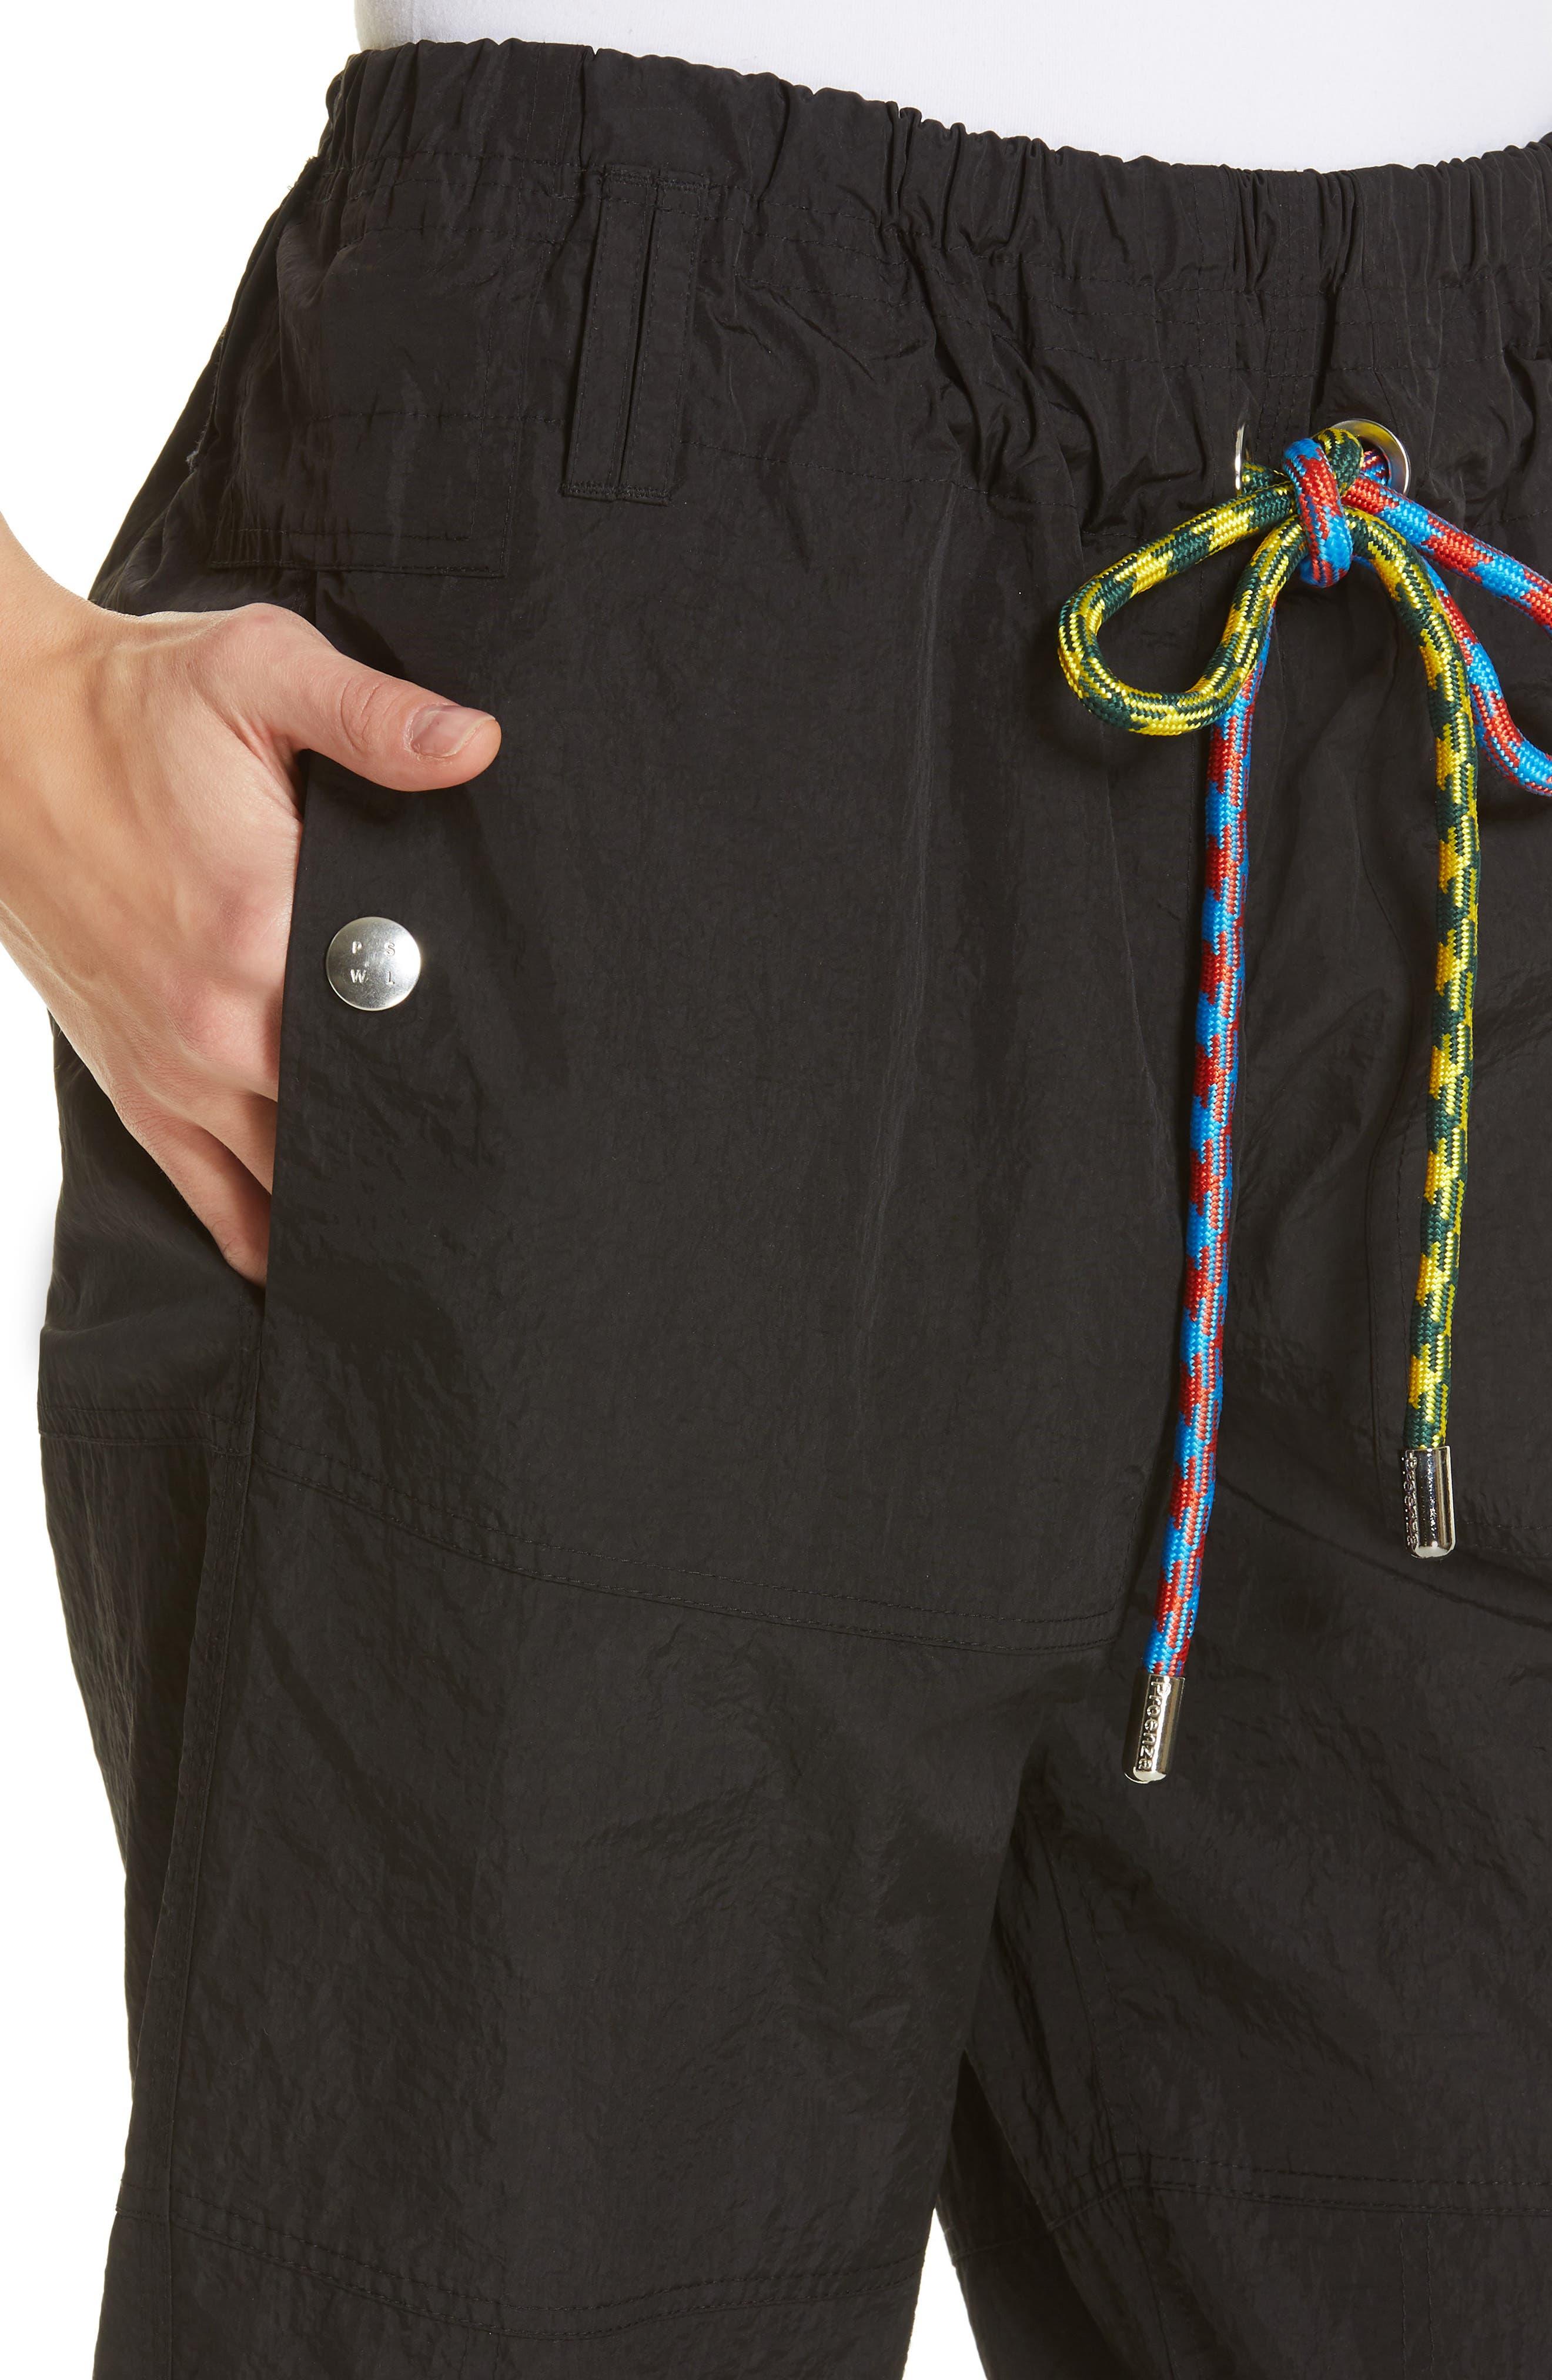 PROENZA SCHOULER, PSWL Drawstring Waist Parachute Pants, Alternate thumbnail 4, color, BLACK